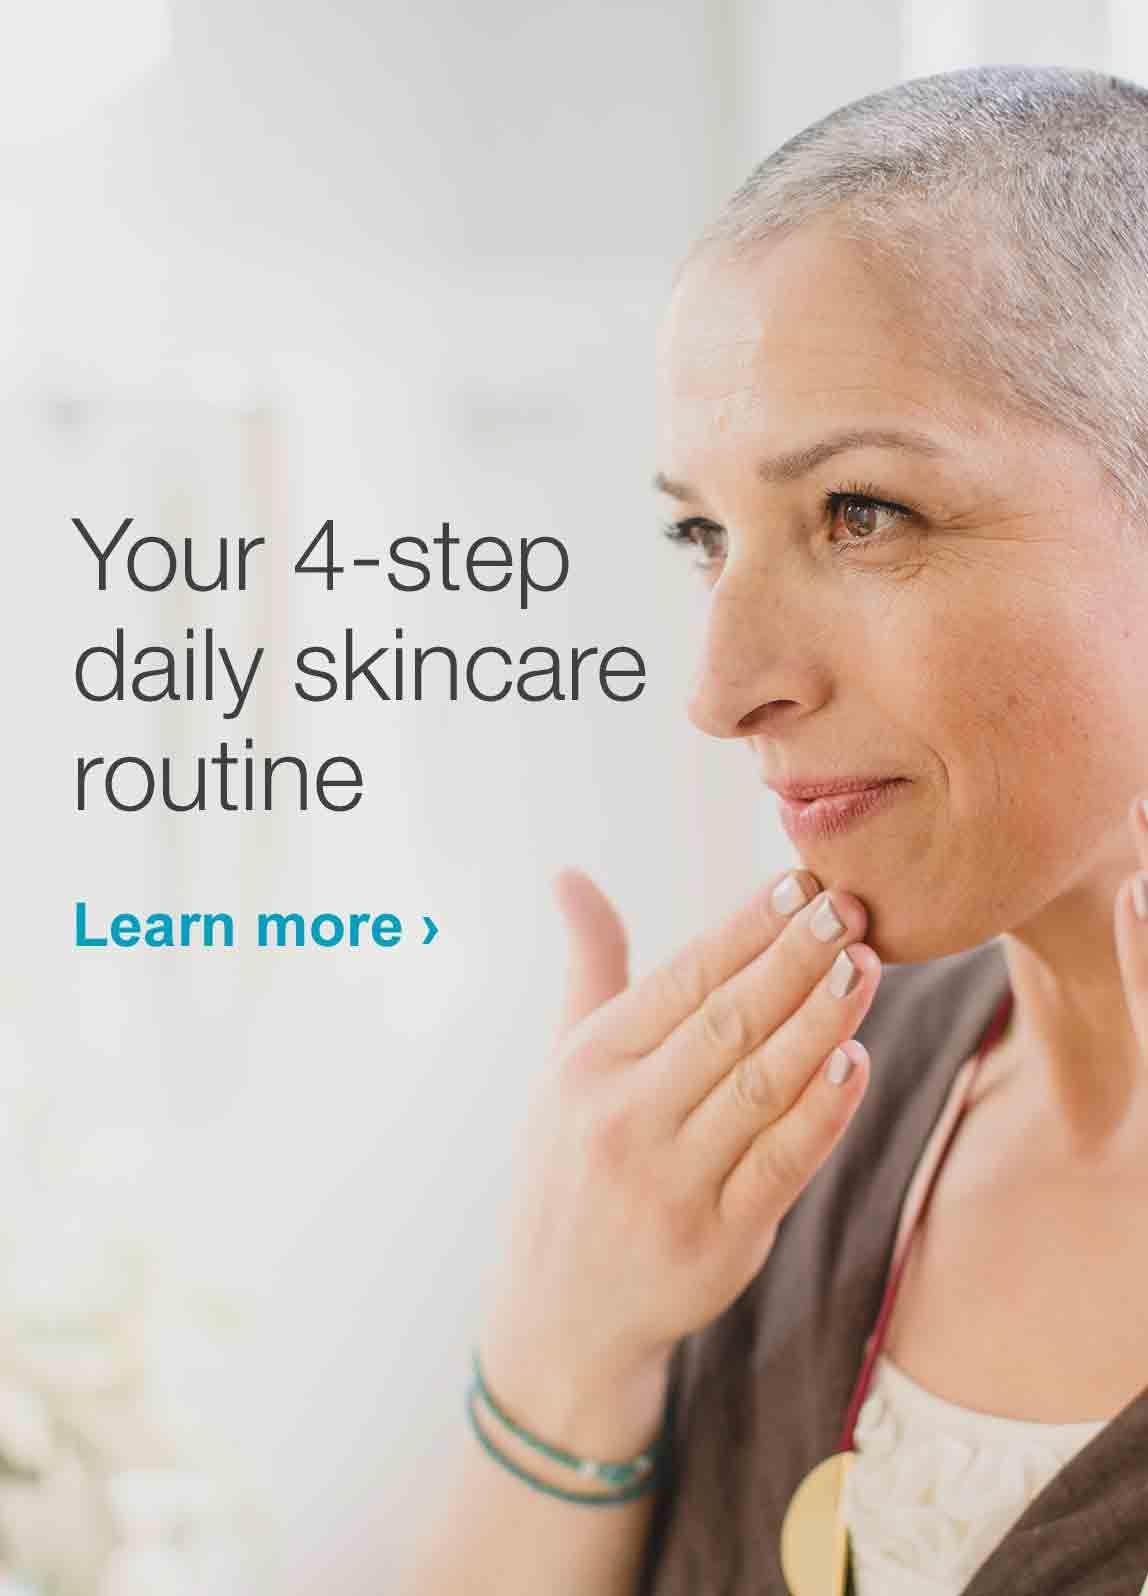 Skin Nail Changes Side Effect Help Chemotherapy Side Effect Help Walgreens Specialty Chemotherapy Side Effects Daily Skin Care Routine Specialty Pharmacy